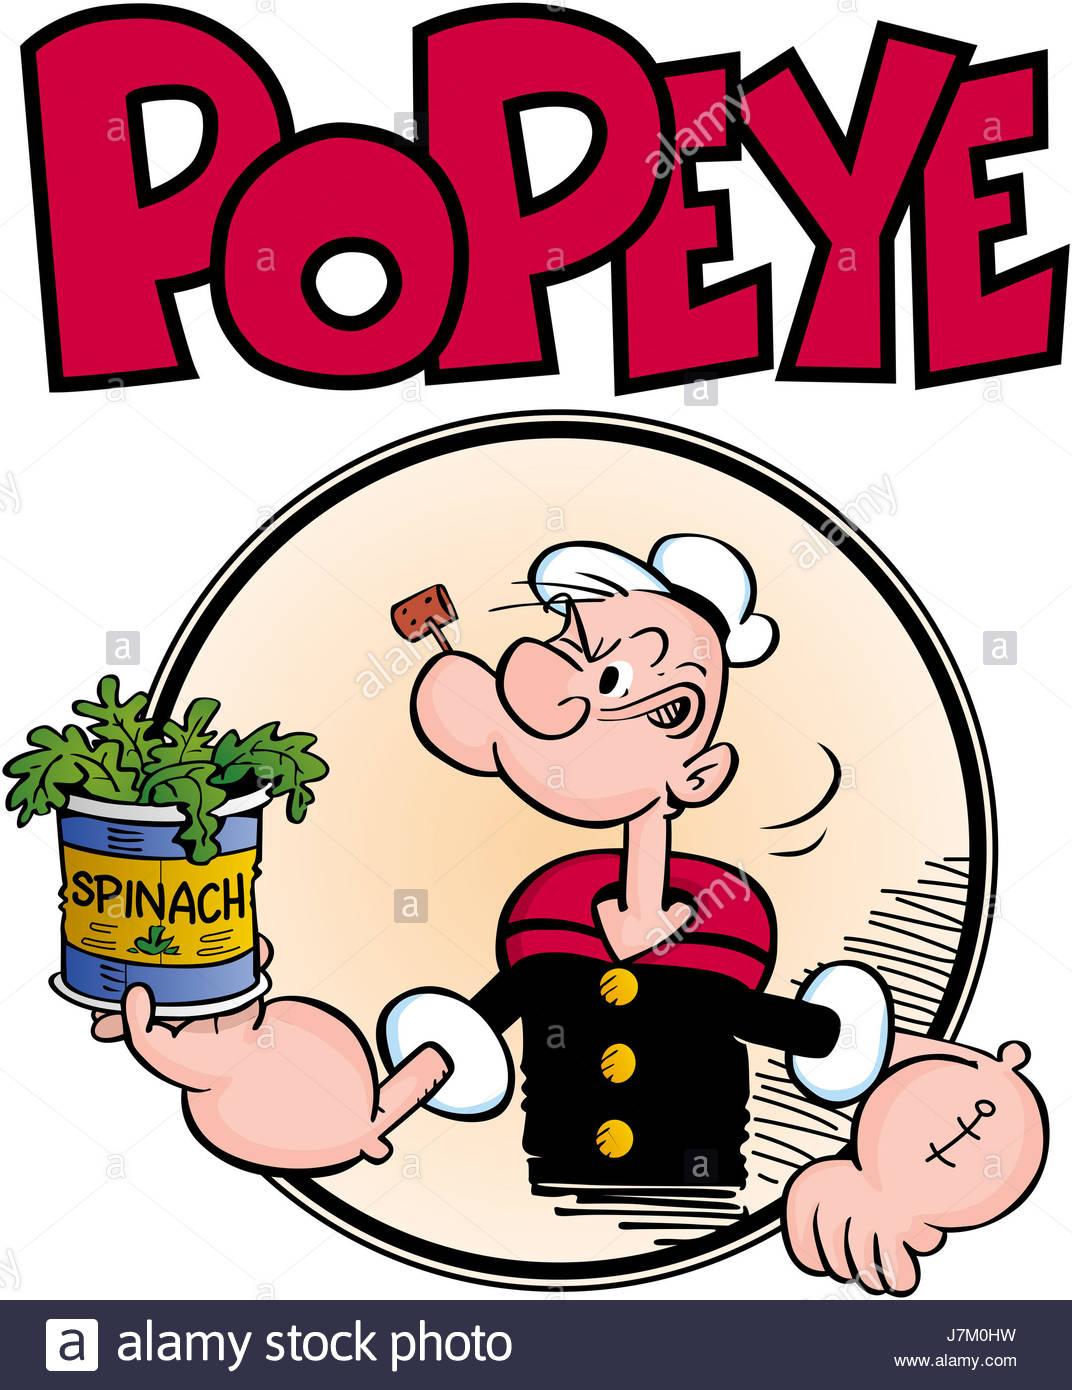 popeye cartoon stock photos popeye cartoon stock images alamy